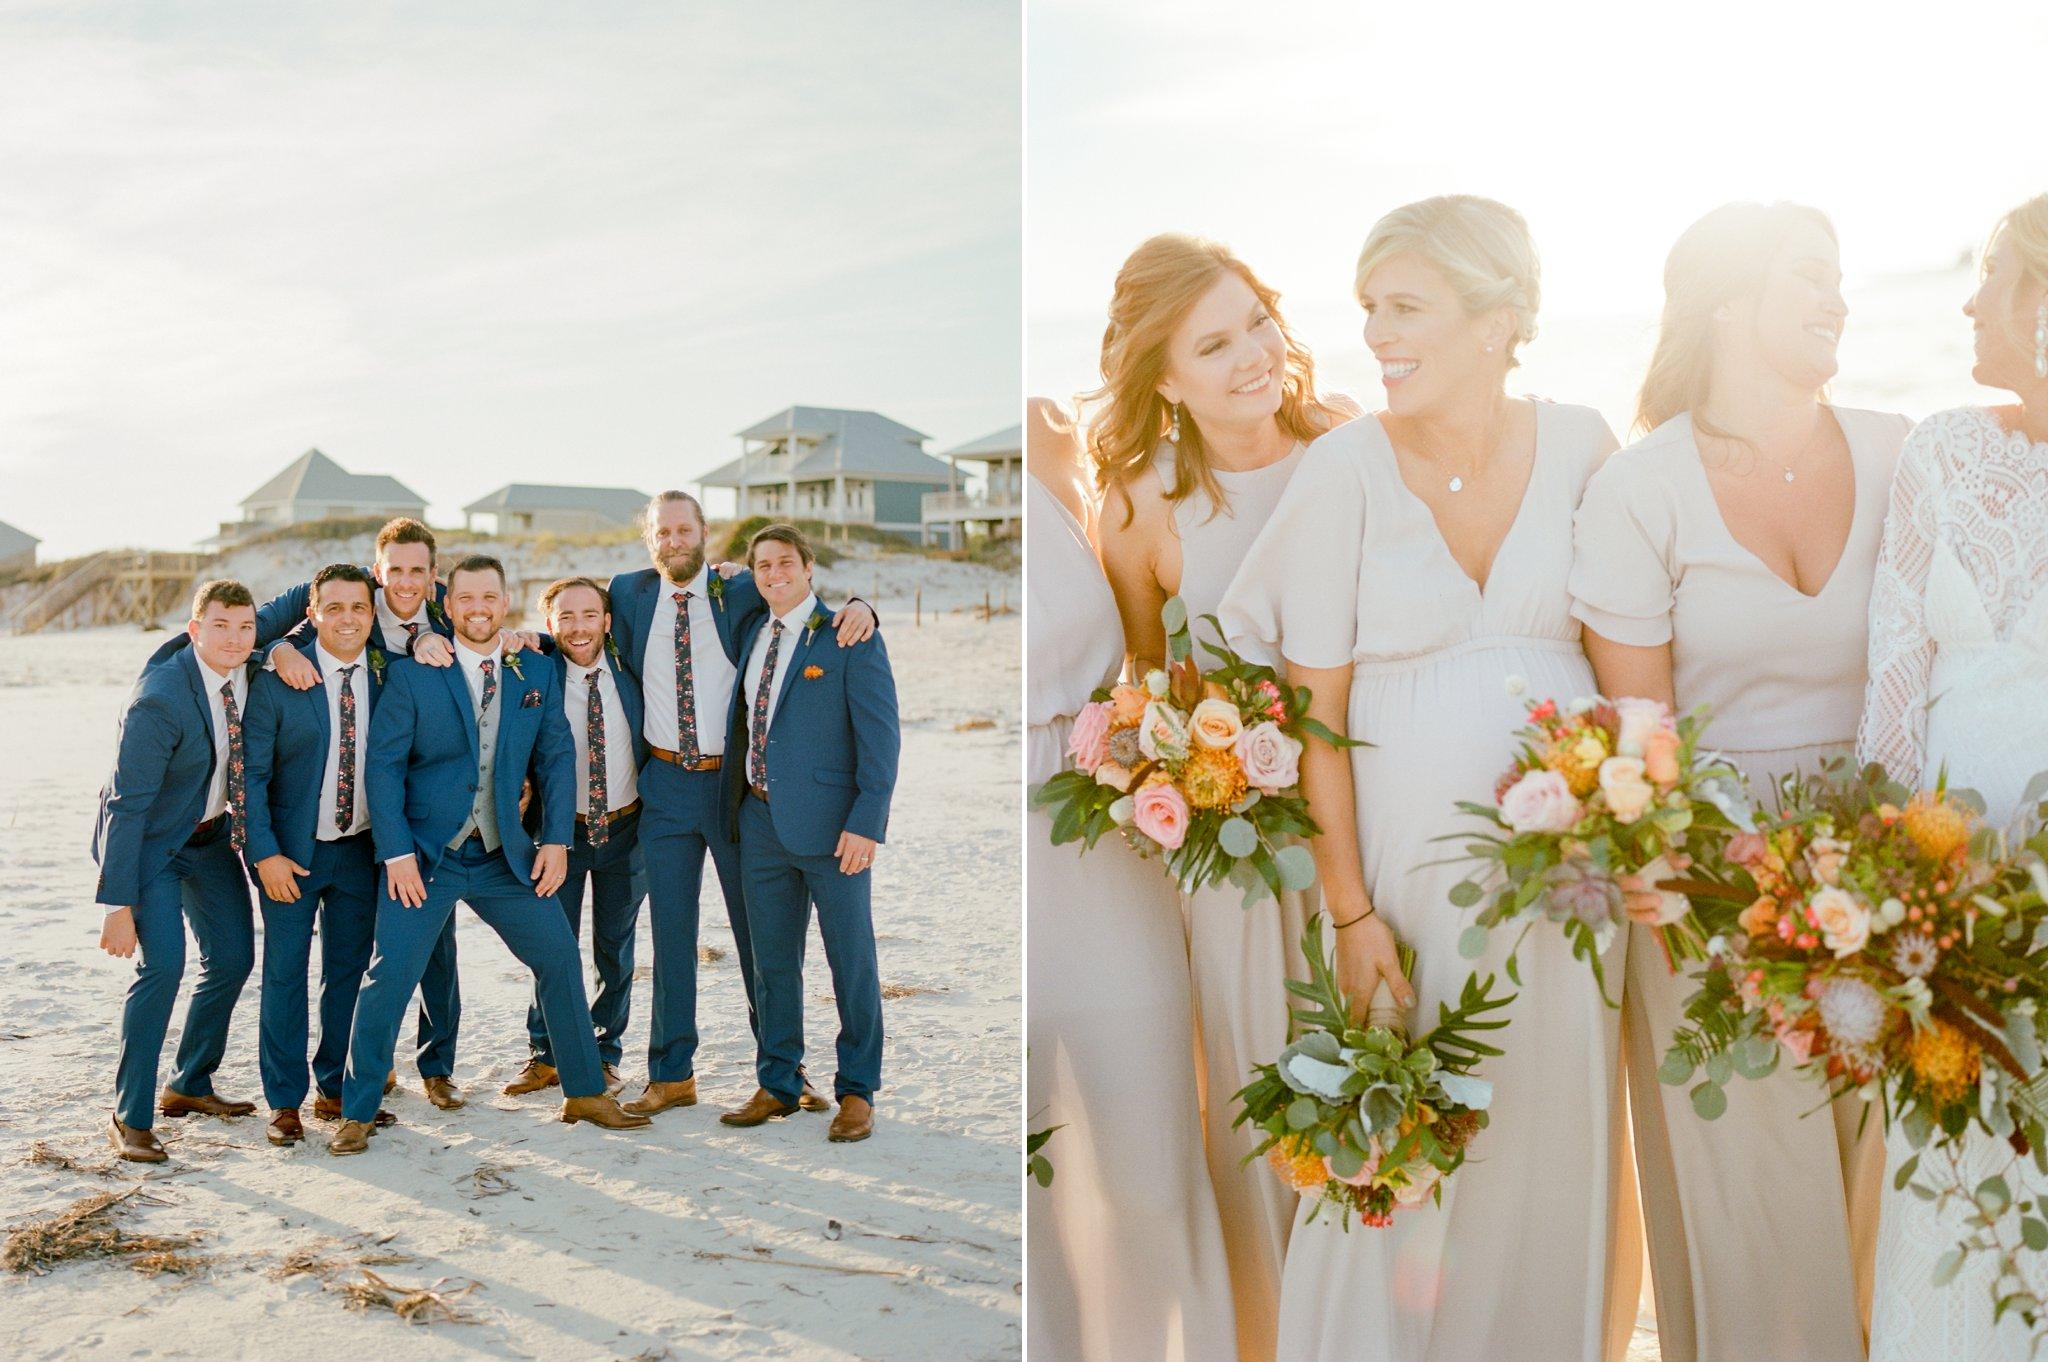 st+george+island+wedding+st+george+island+photographer+shannon+griffin+photography_0042.jpg